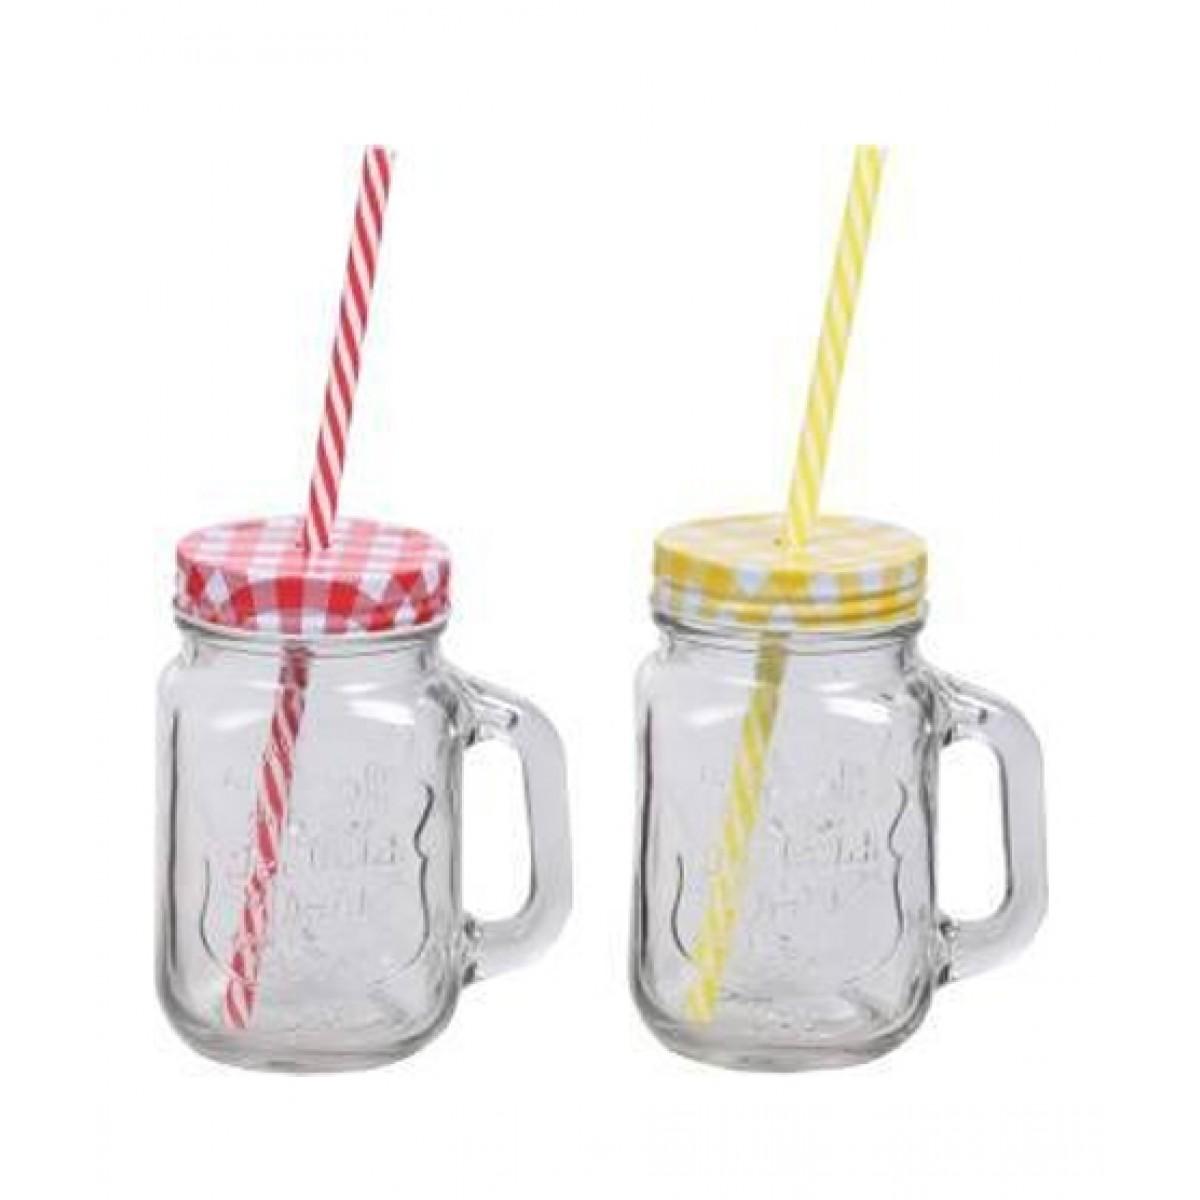 ORO Store Plain Mason Jar Mug with Lid & Straw - Pack Of 2